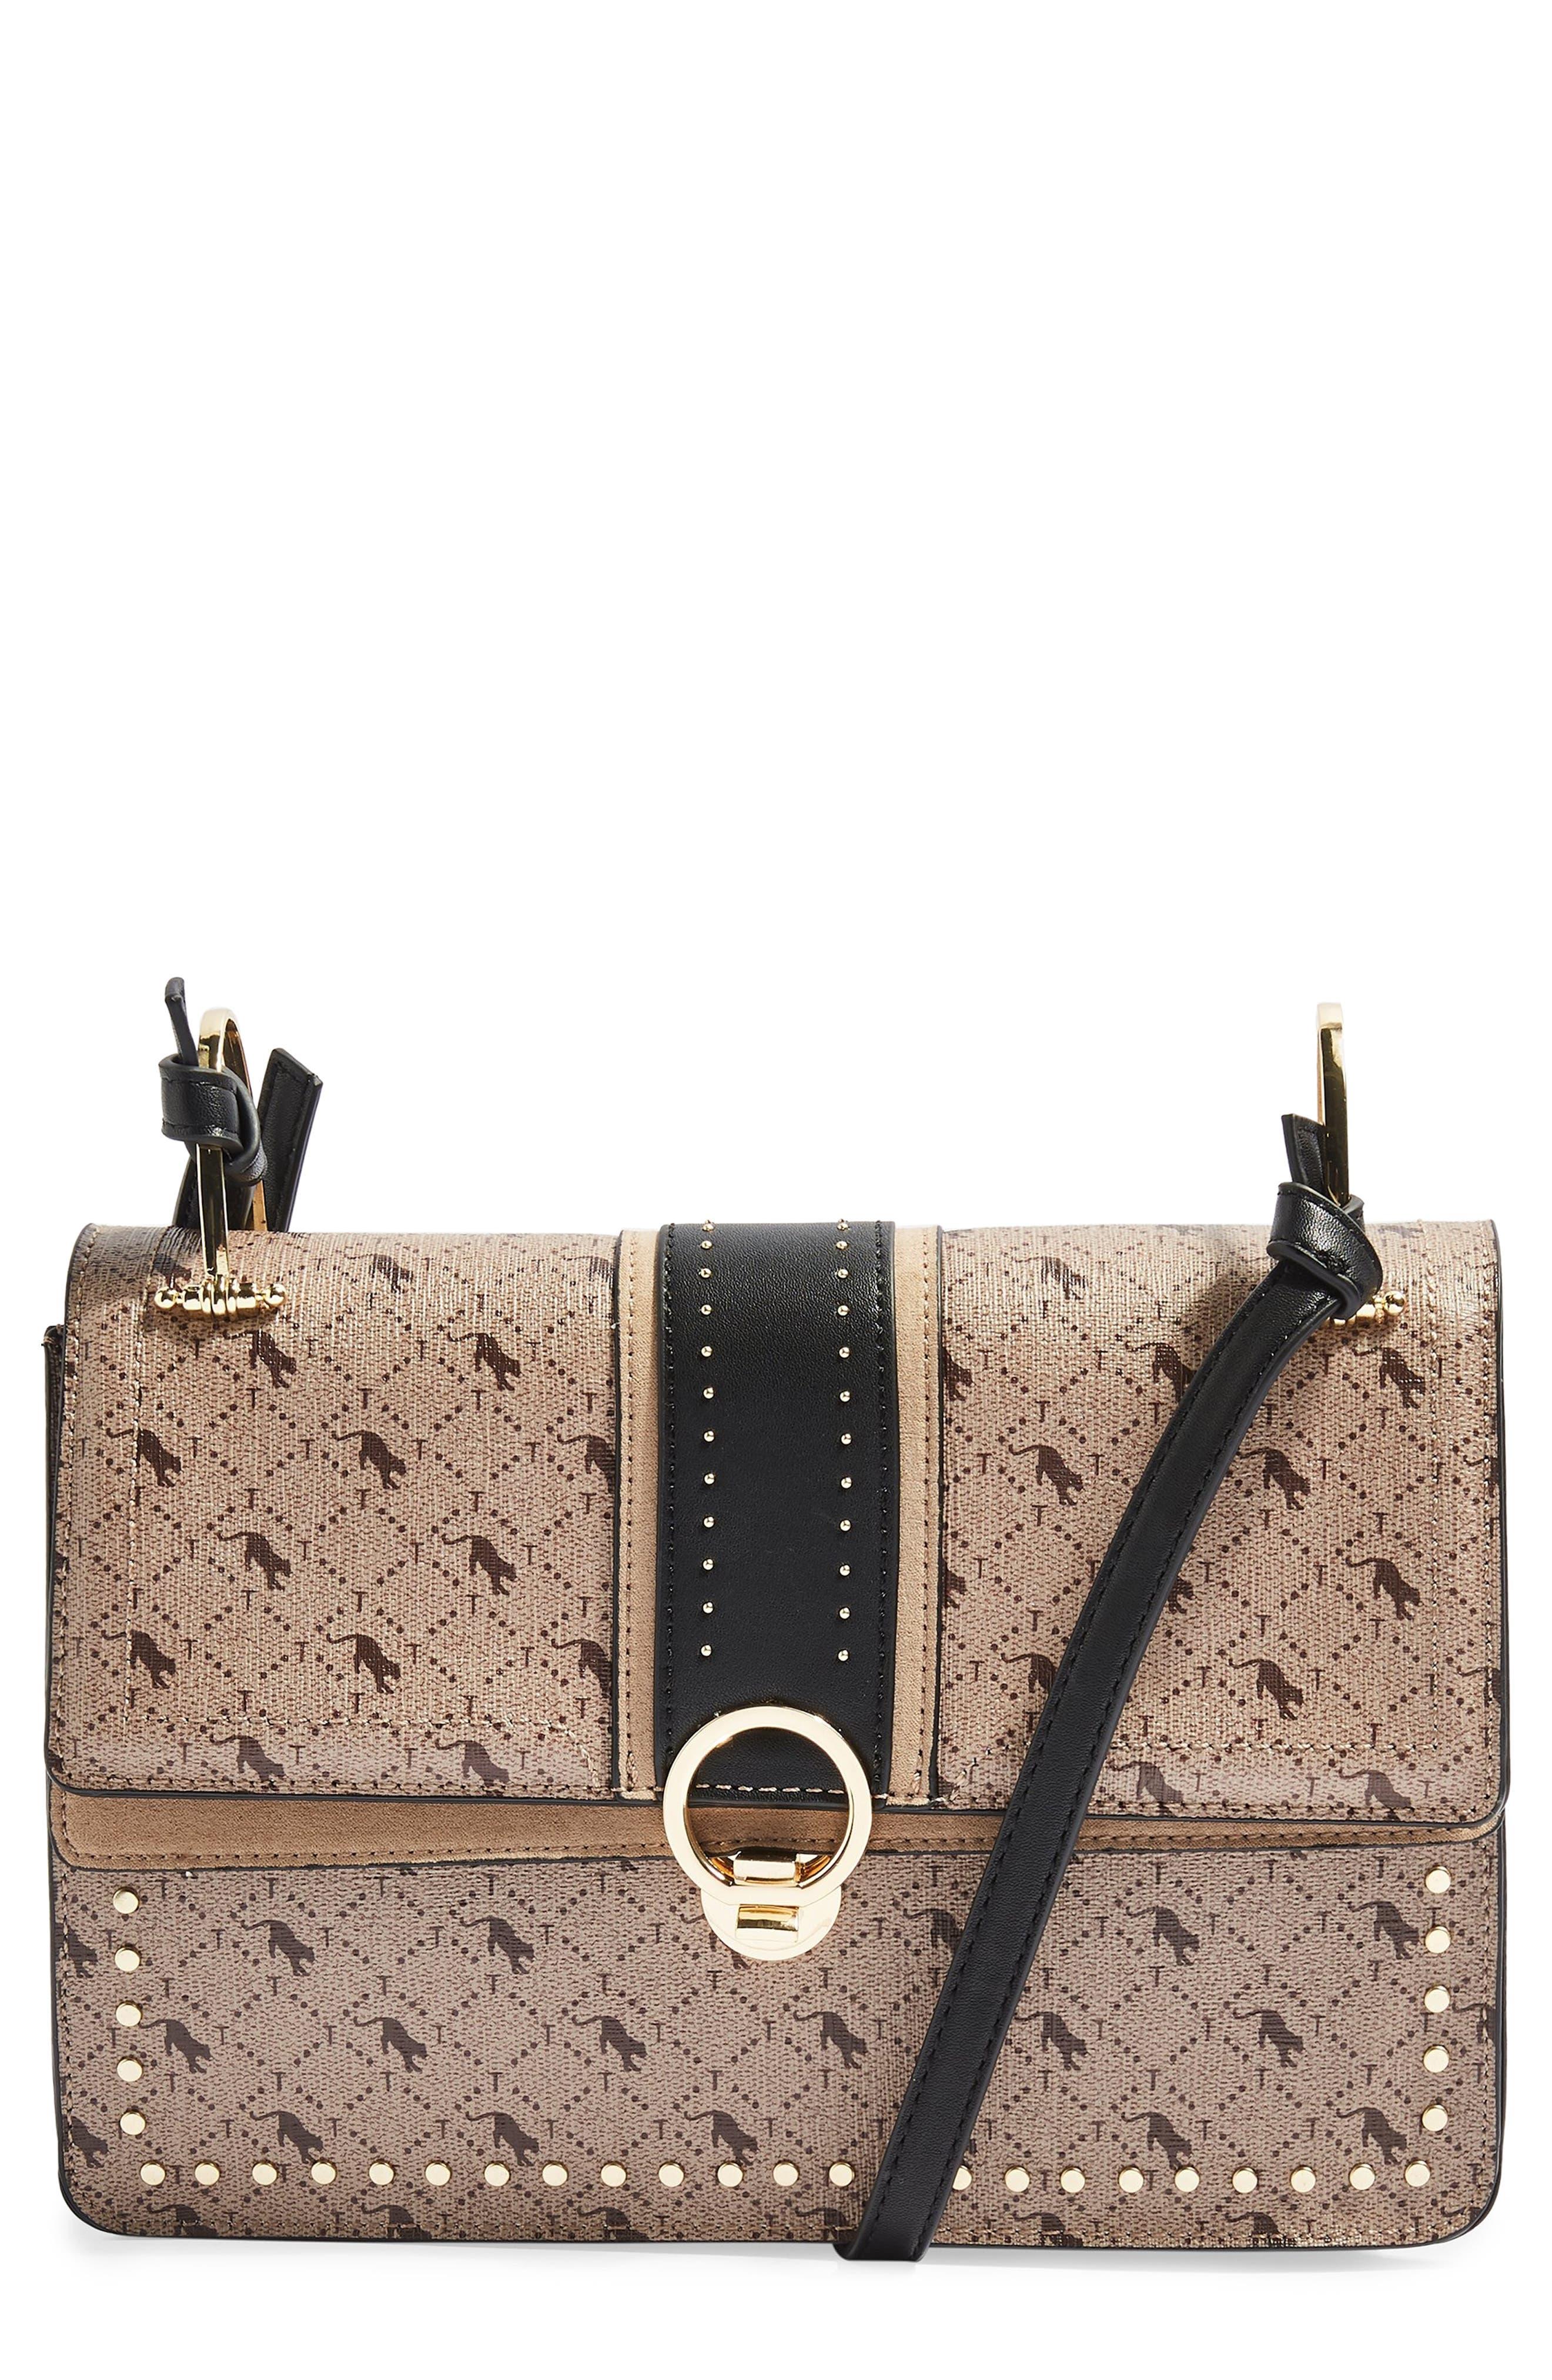 Madrid Studded Faux Leather Shoulder Bag,                         Main,                         color, TAUPE MULTI